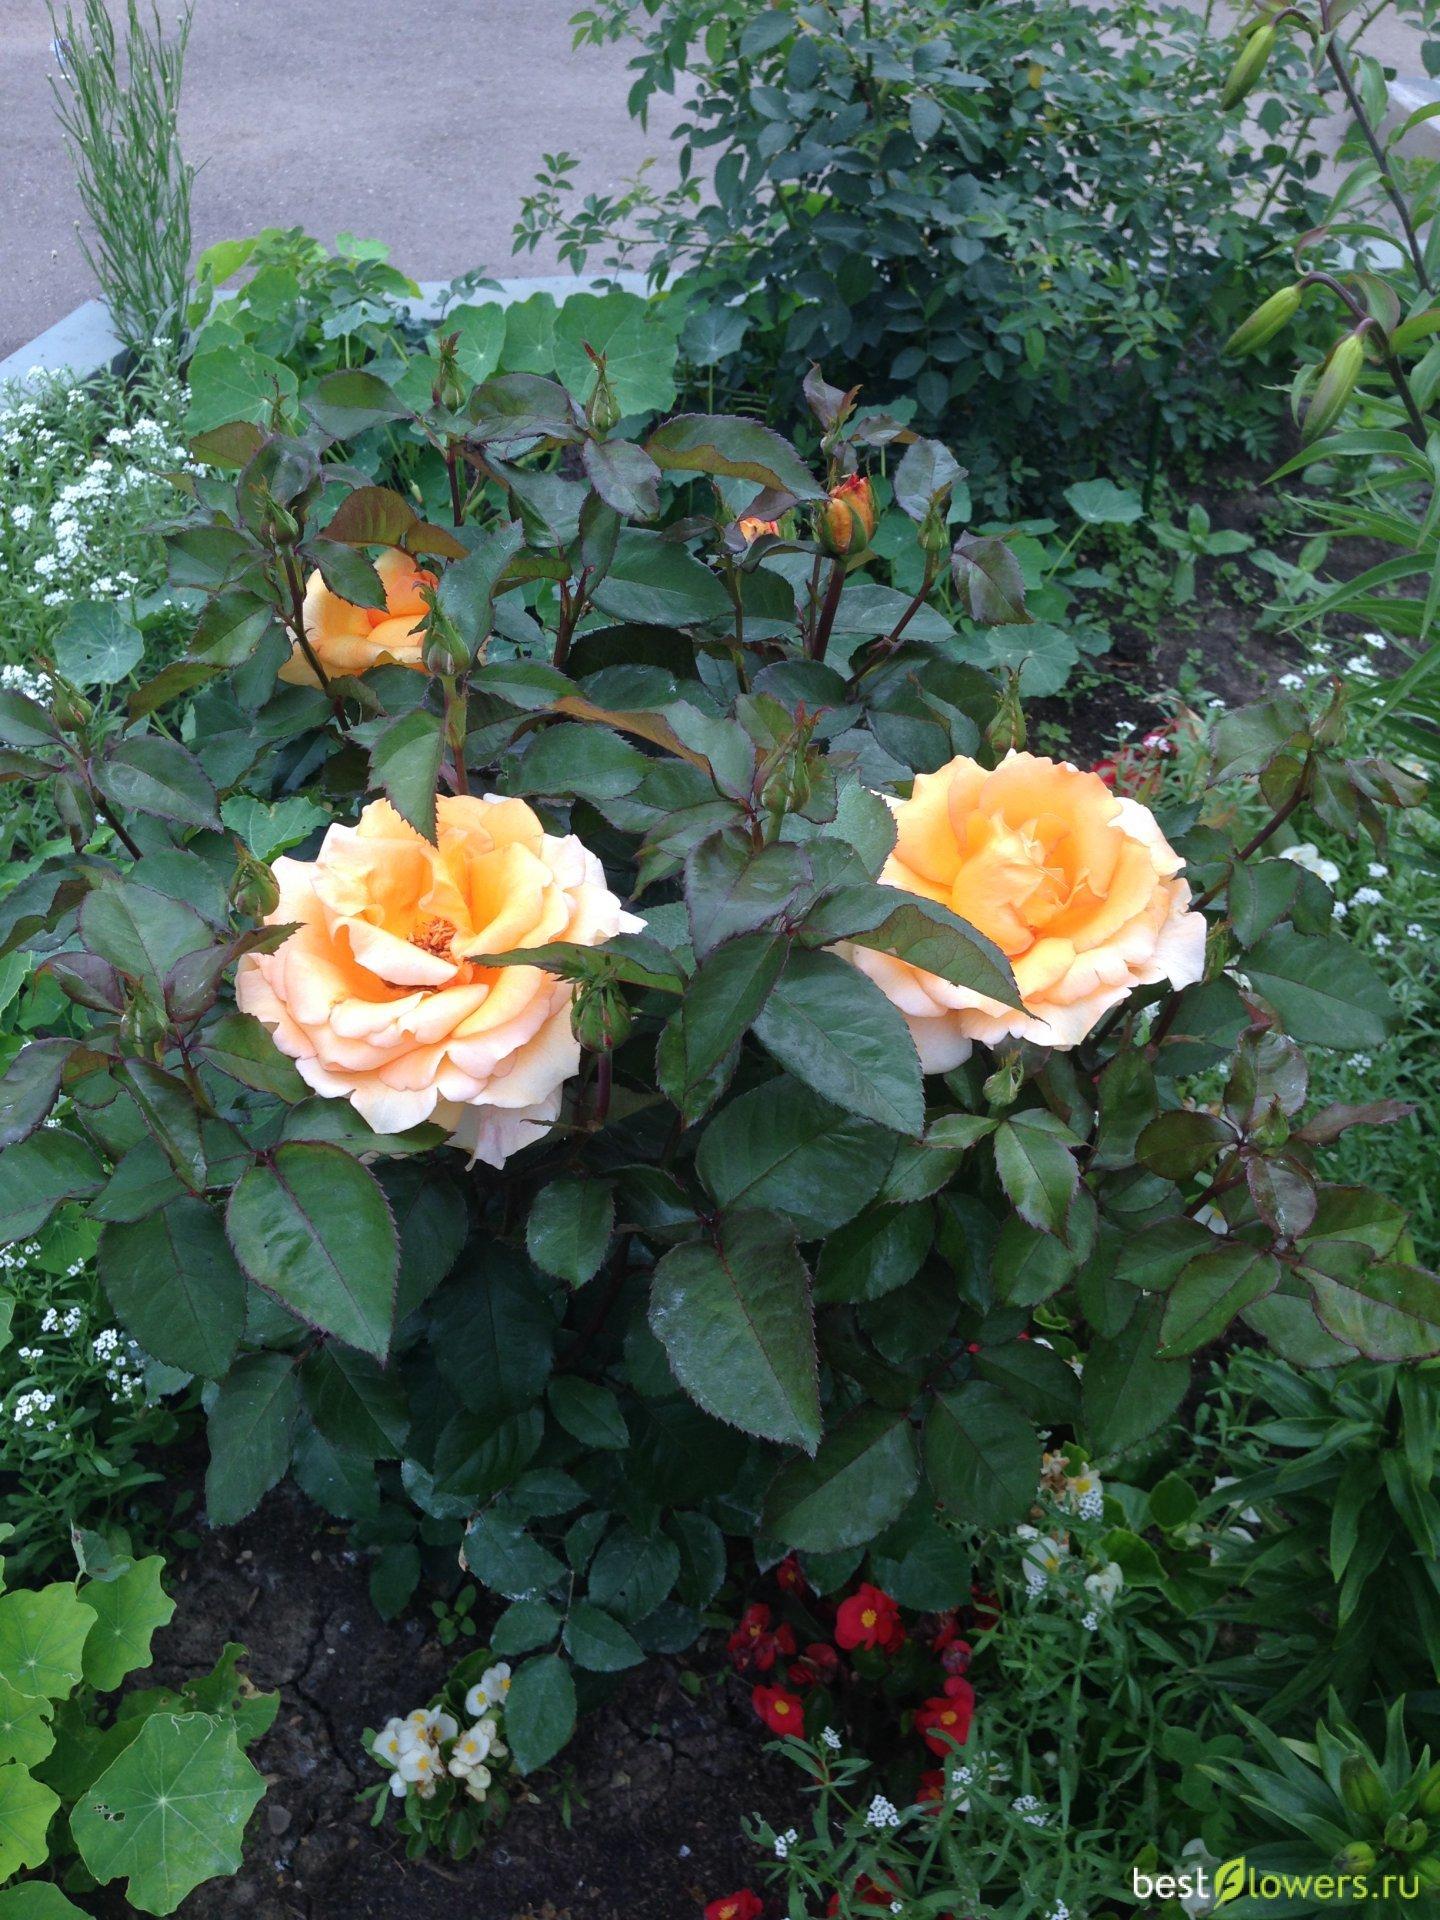 роза эльдорадо фото описание связи истечением